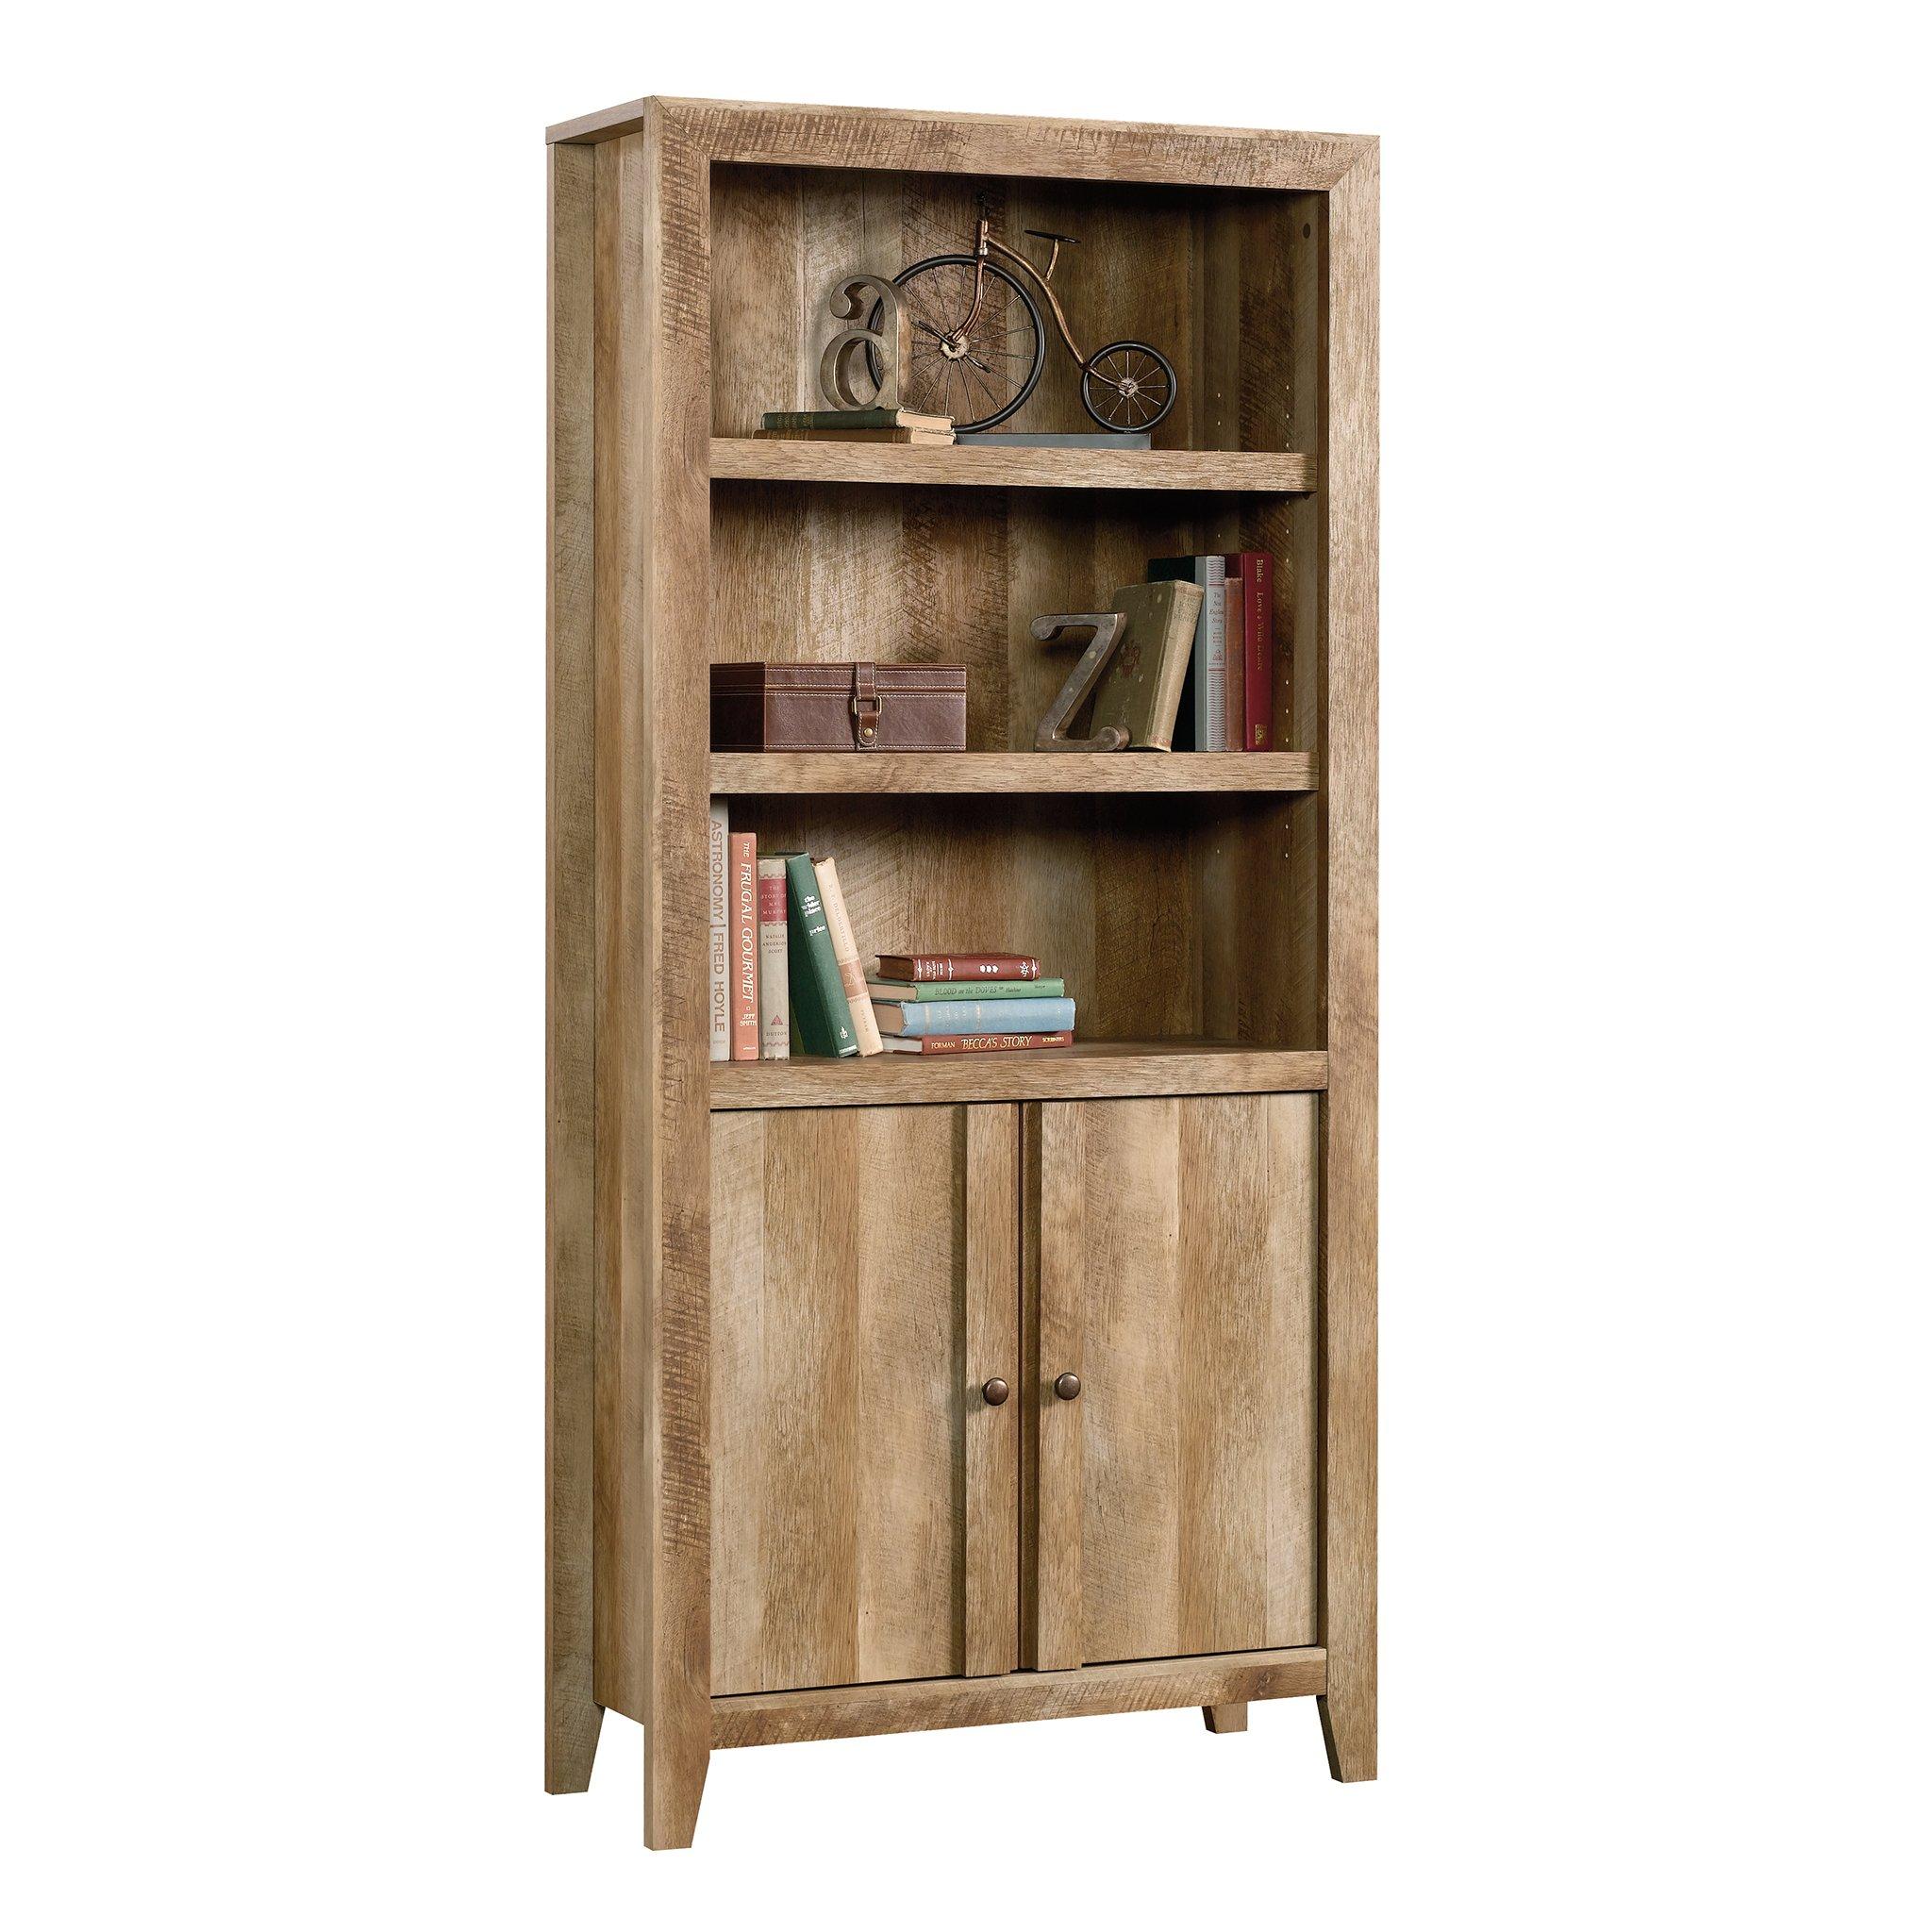 Sauder 420409 Dakota Pass Library with Doors, L: 33.82'' x W: 12.52'' x H: 71.10'', Craftsman Oak Finish by Sauder (Image #2)